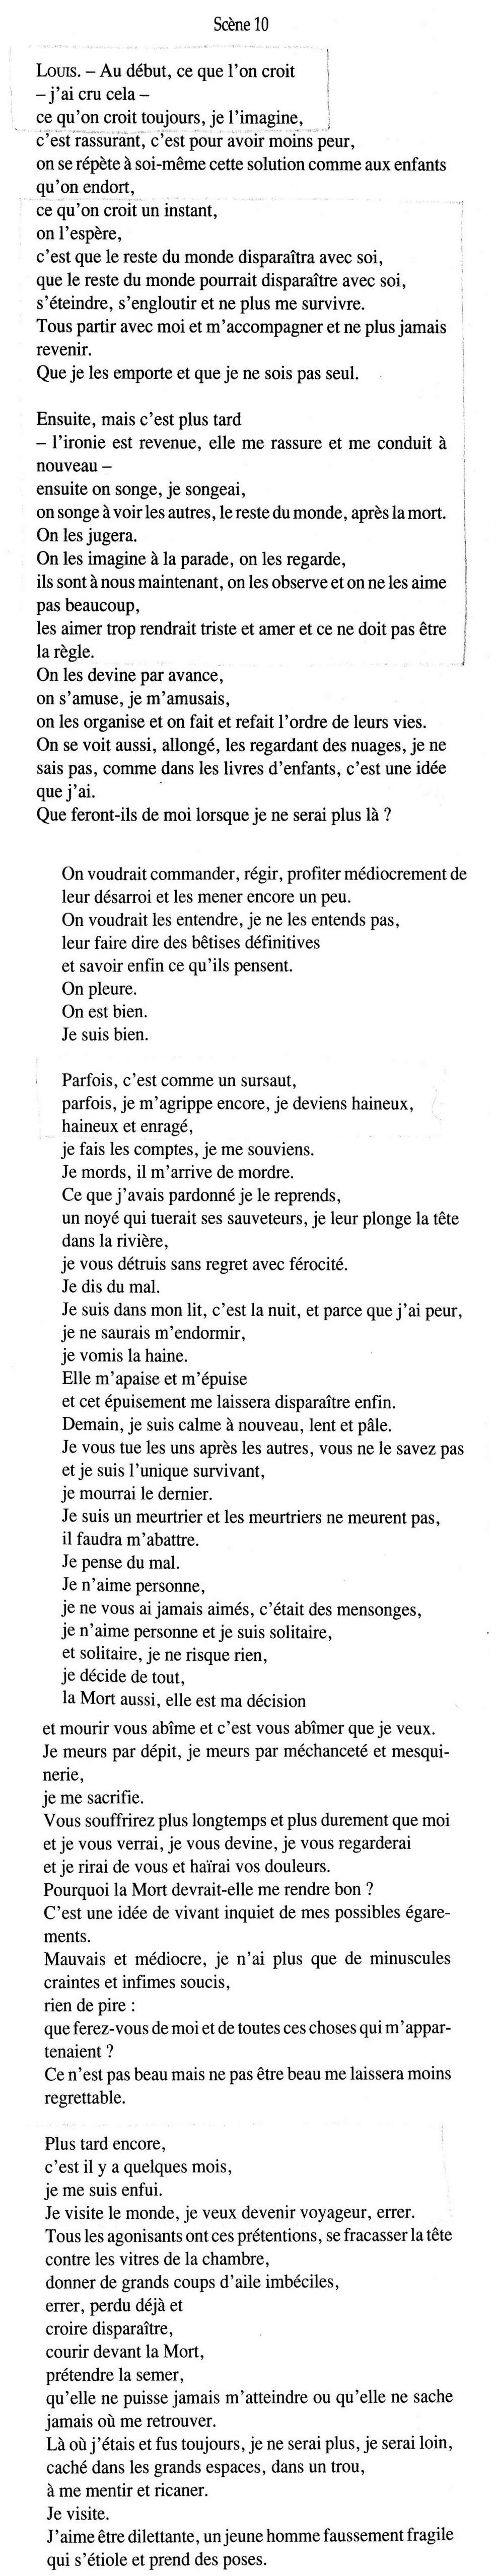 http://lire.cowblog.fr/images/1/Lagarcegrand.jpg